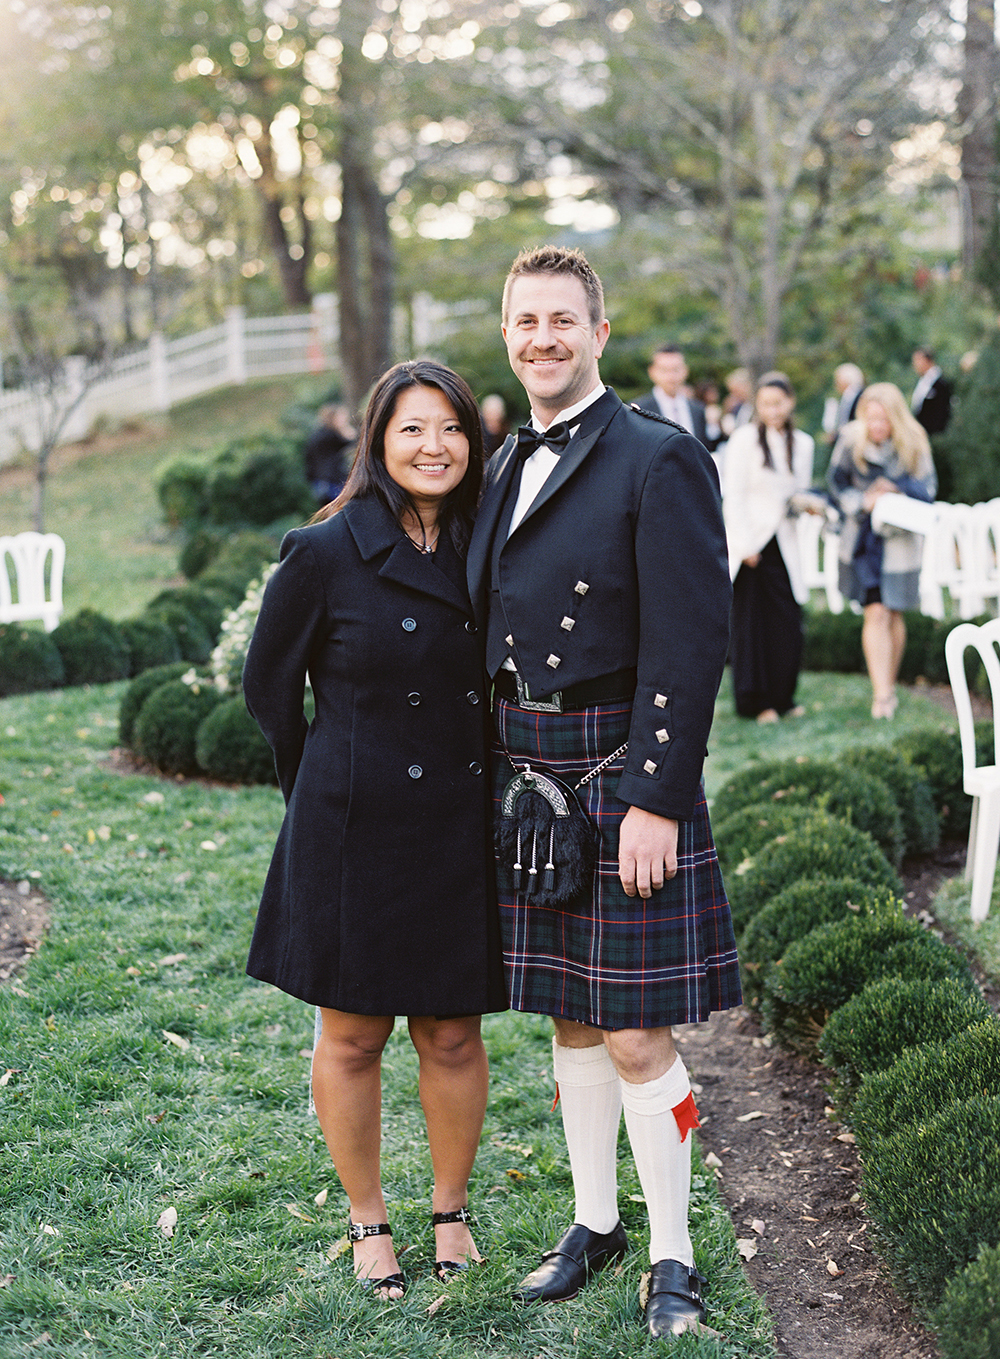 fall wedding guests attire layers jacket dress kilt